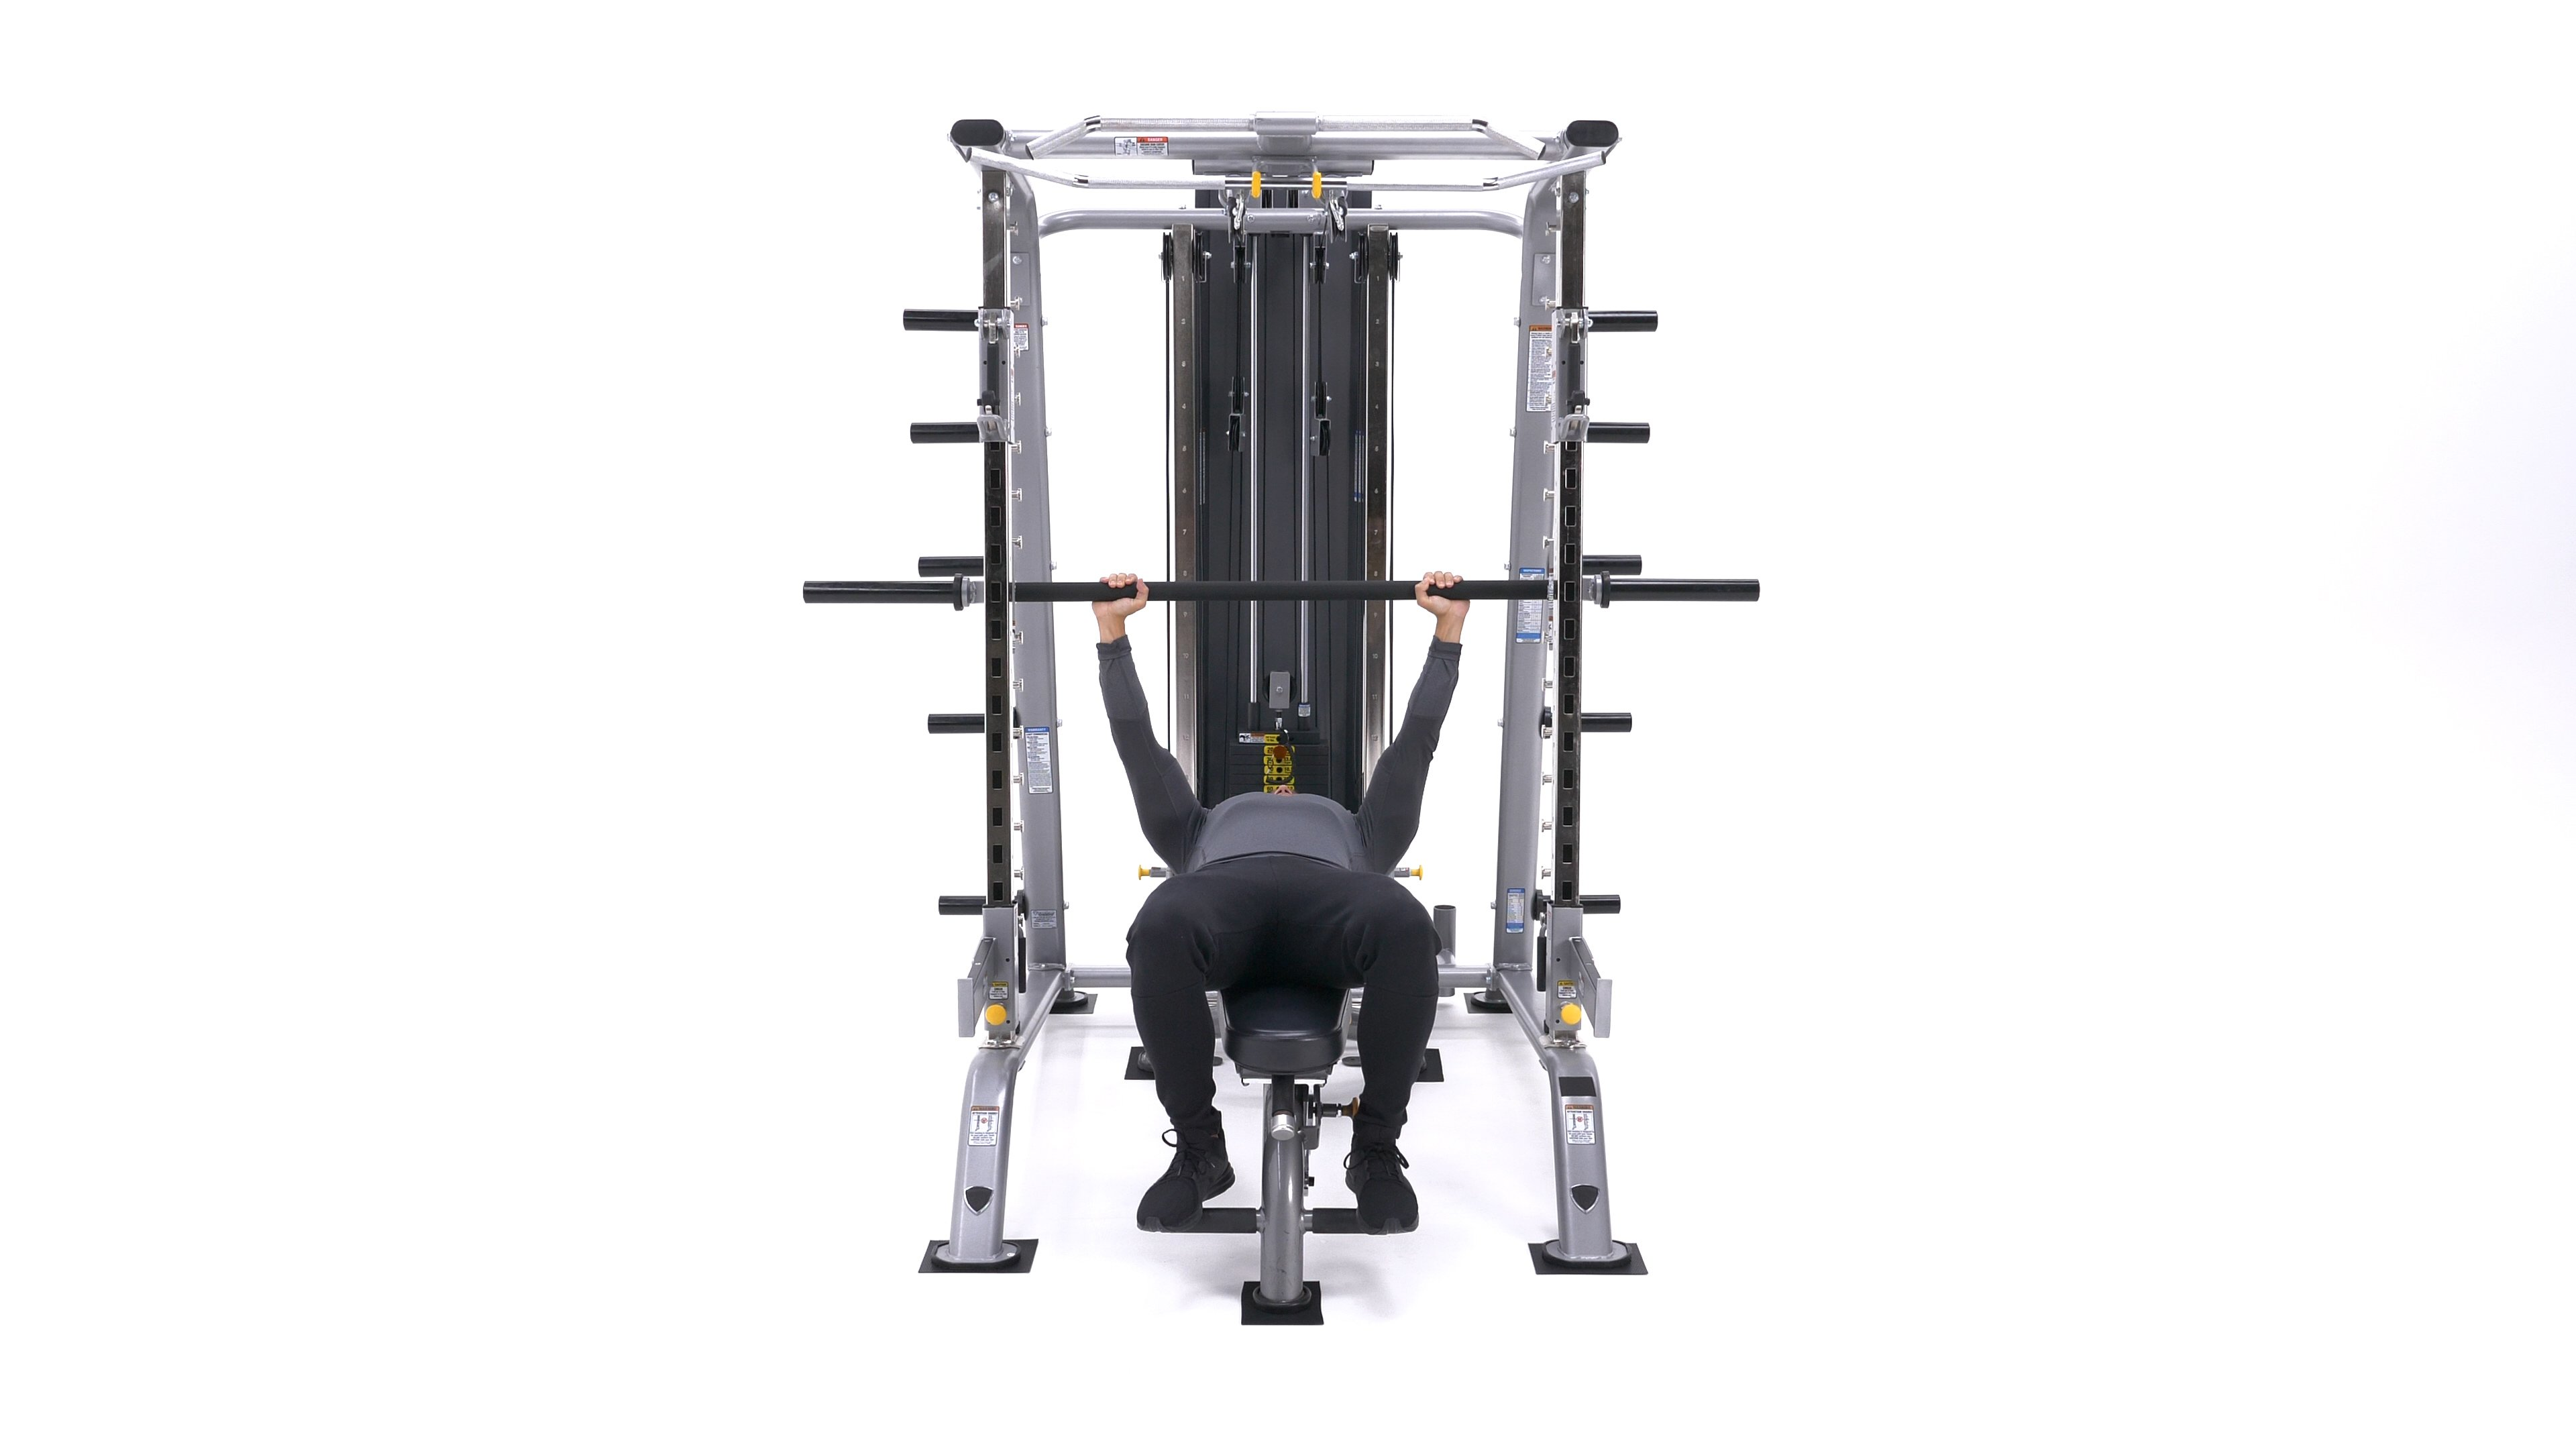 Smith machine bench press image